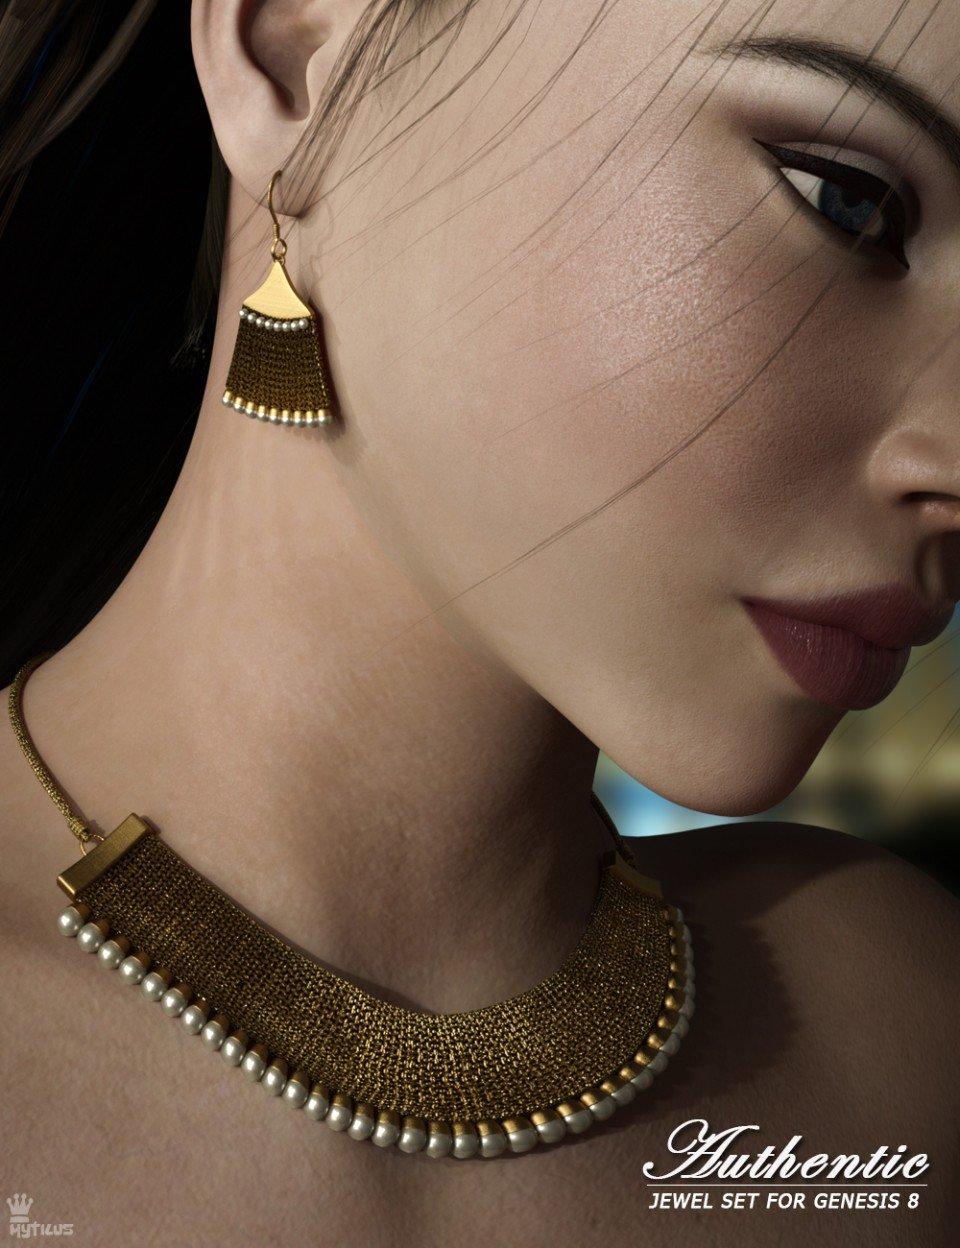 Authentic Jewel Set for Genesis 8 Female(s)_DAZ3D下载站